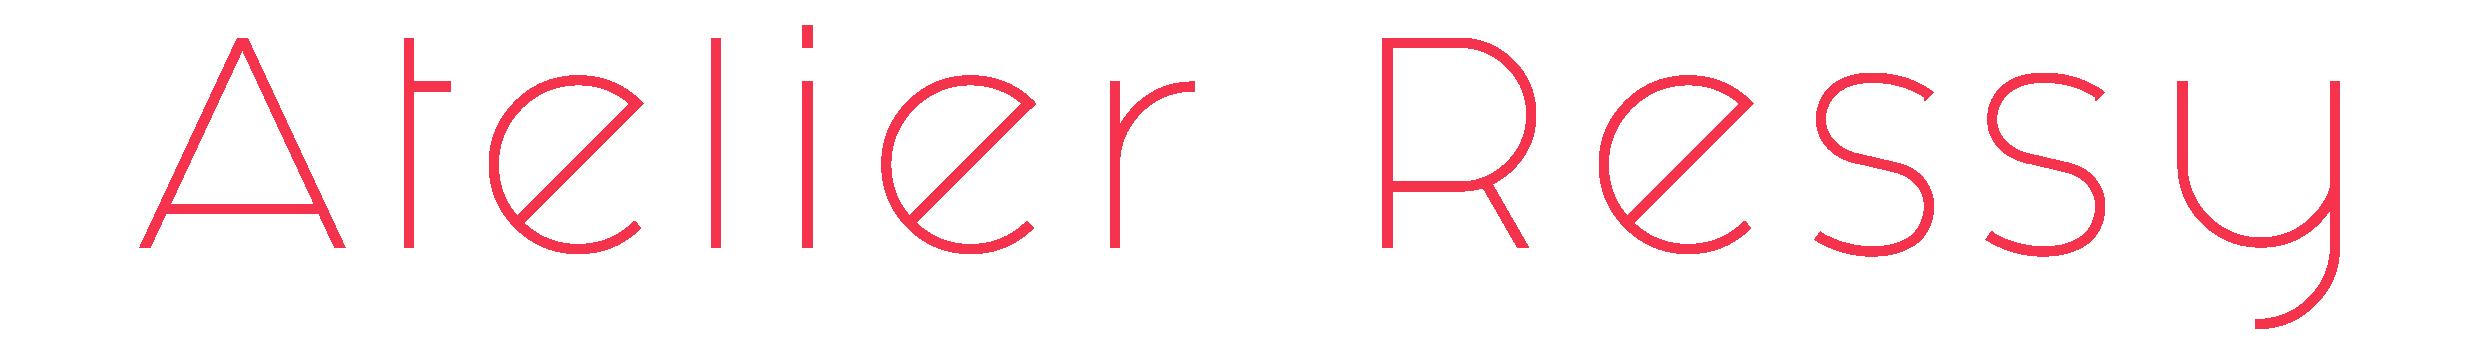 Atelier ressy logo grenadine